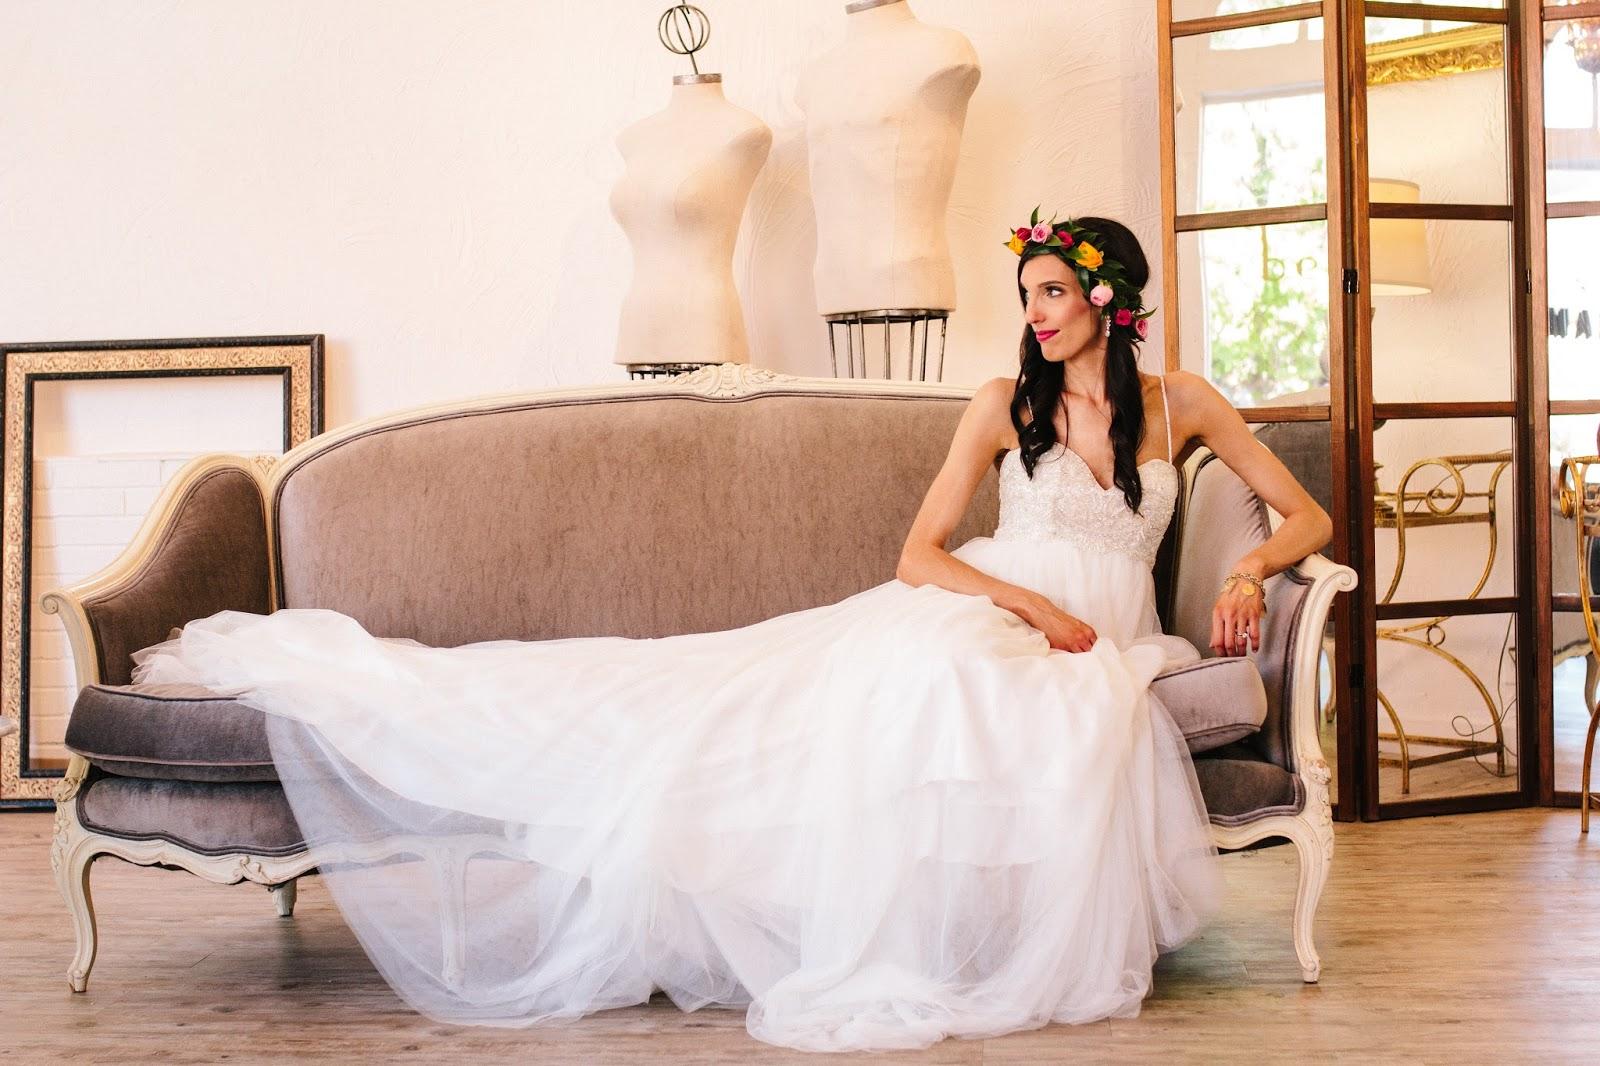 oklahoma bridals